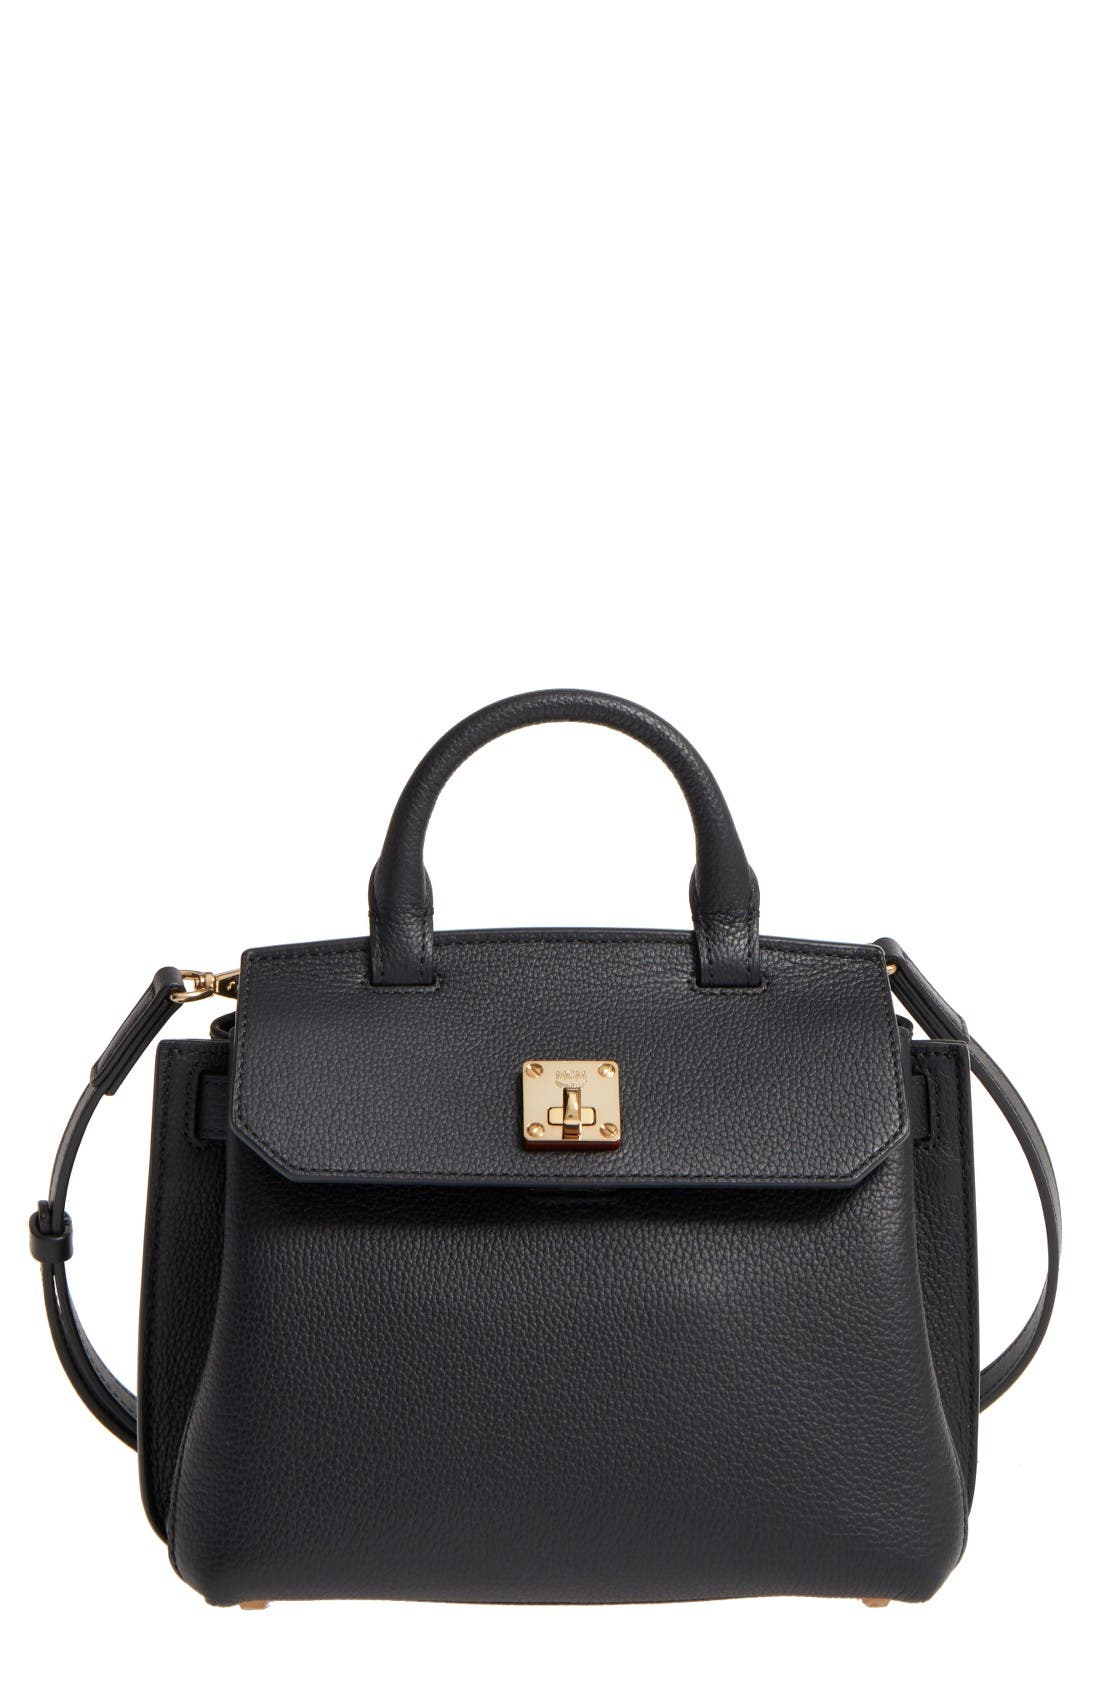 Alternate Image 1 Selected - MCM Milla Leather Crossbody Bag